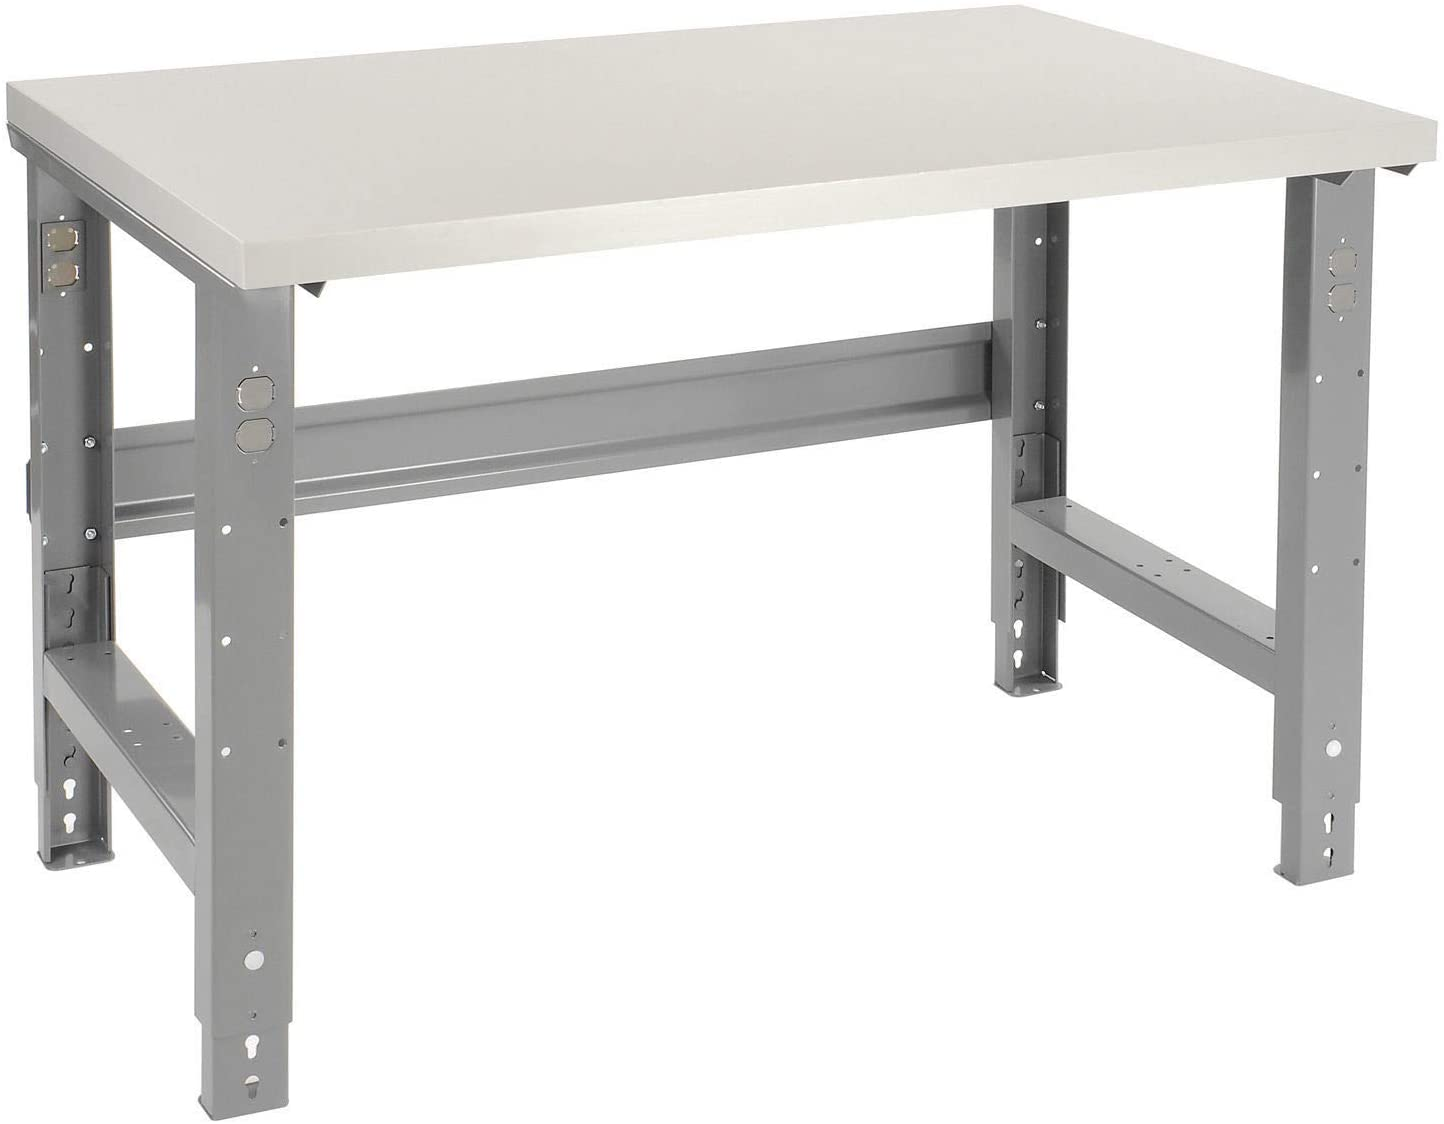 Adjustable Height Workbench C-Channel Leg, Plastic Laminate Square Edge, 48